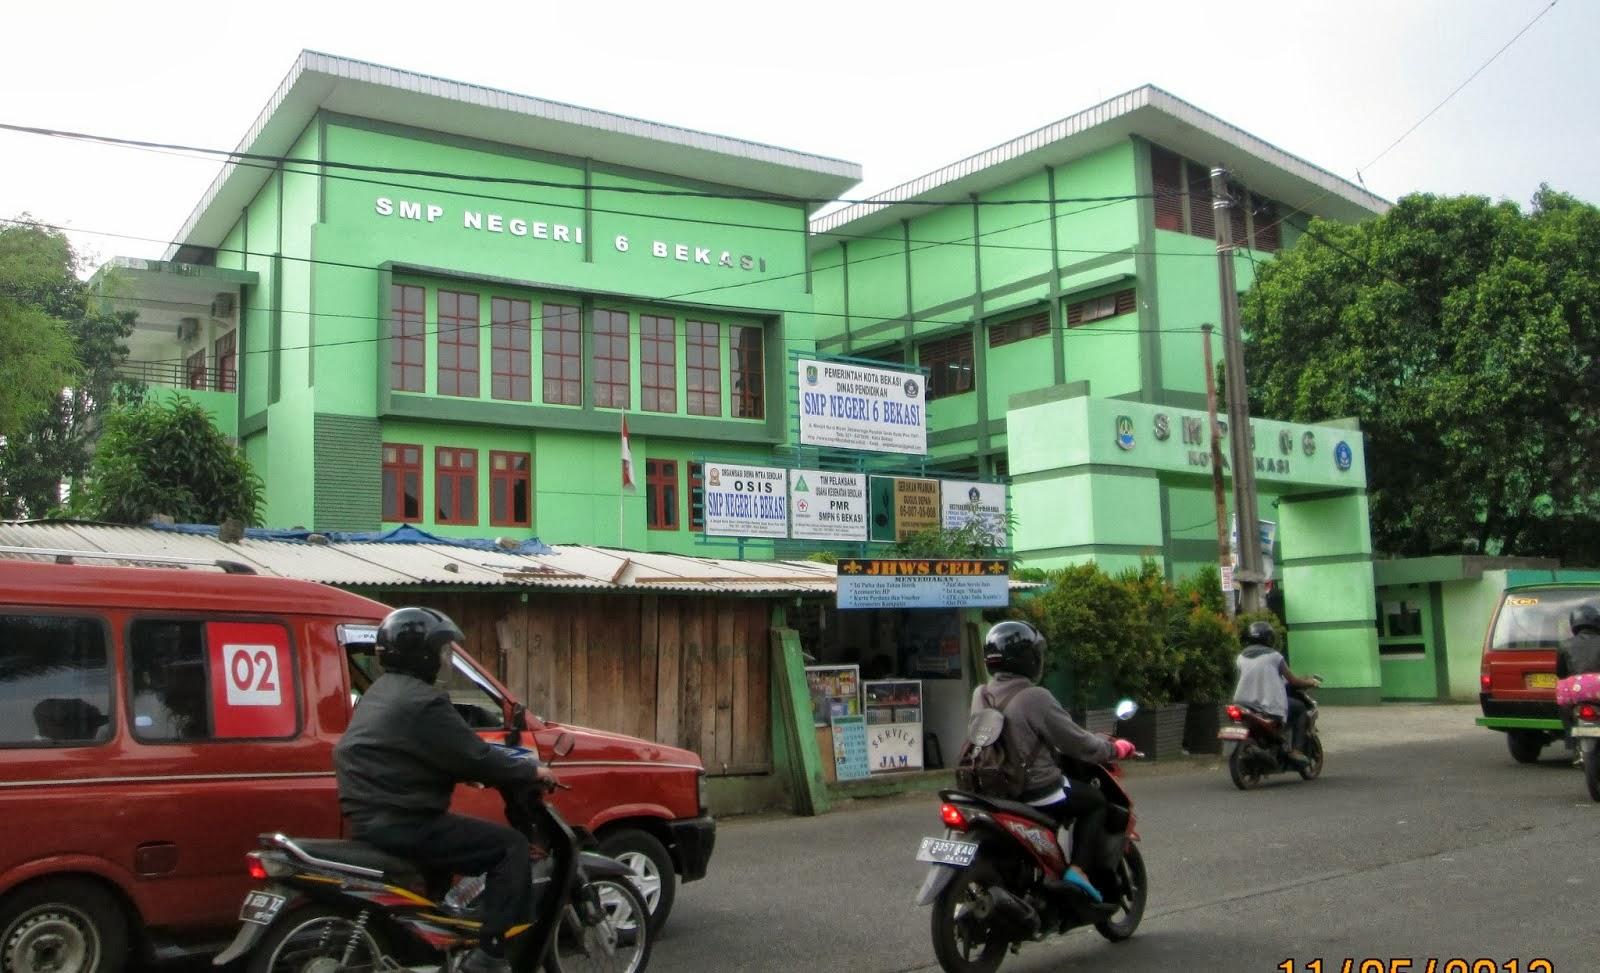 Musang Area Tentang Smpn 06 Bekasi